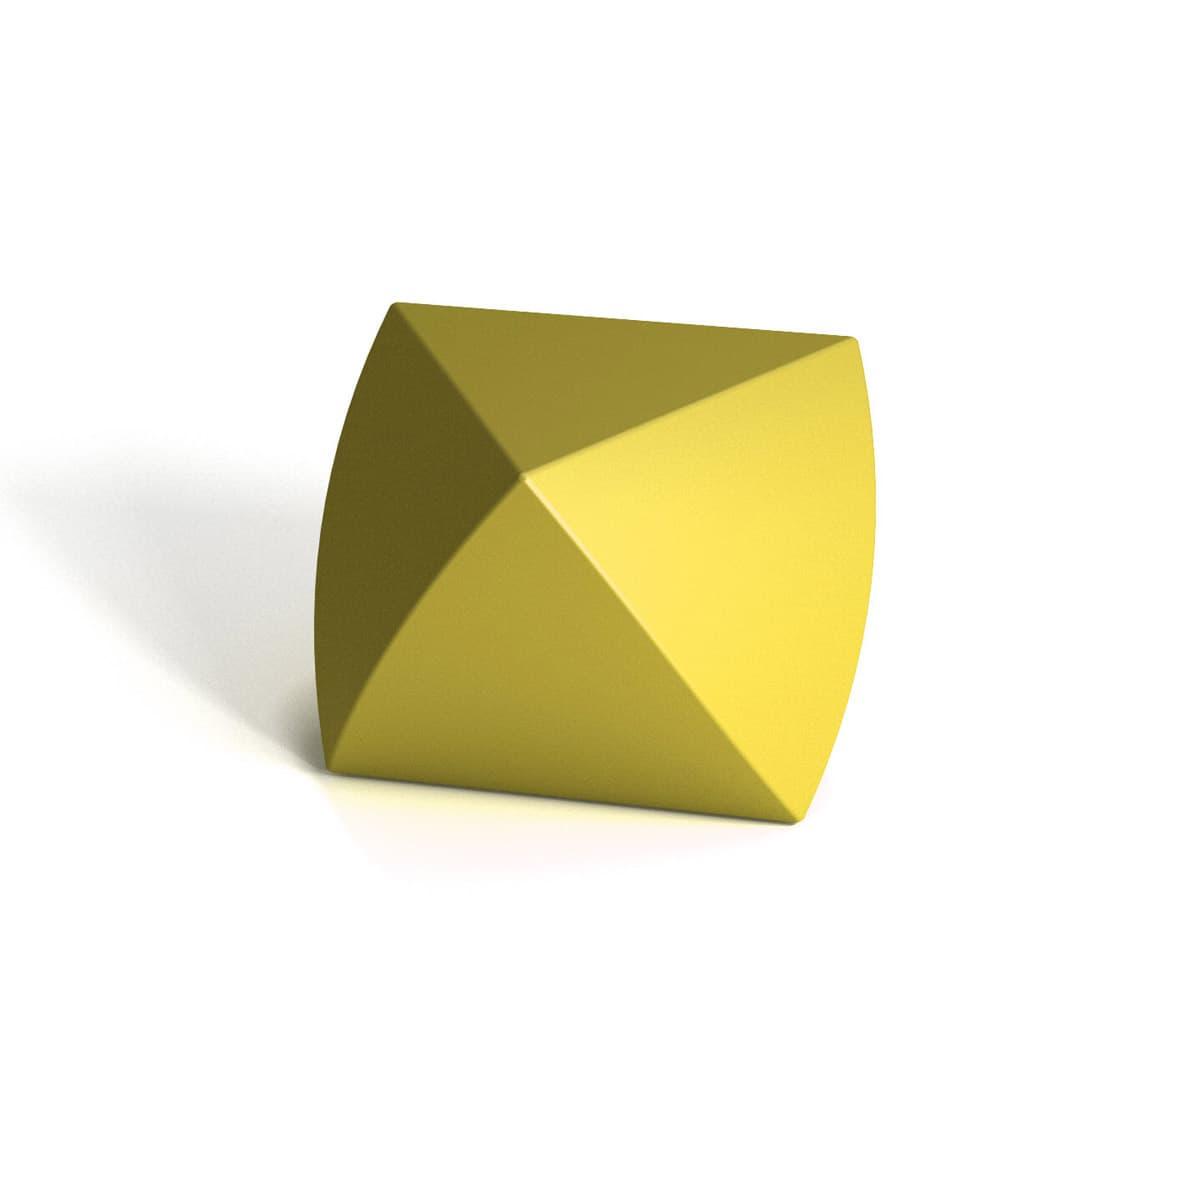 Block Prism stools